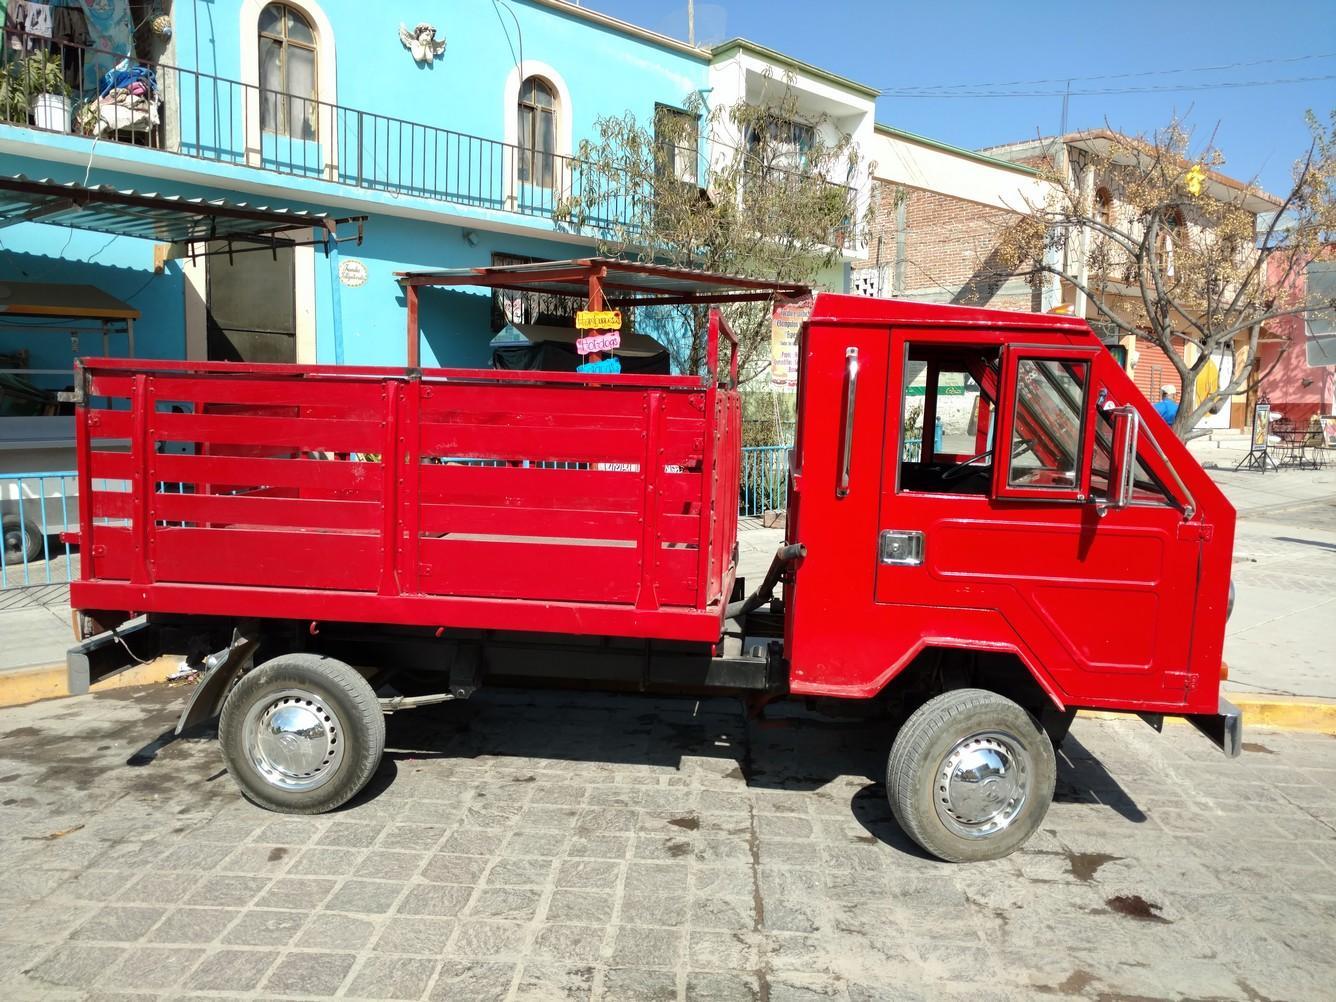 VW Truck2 Dolores Hidalgo 2017